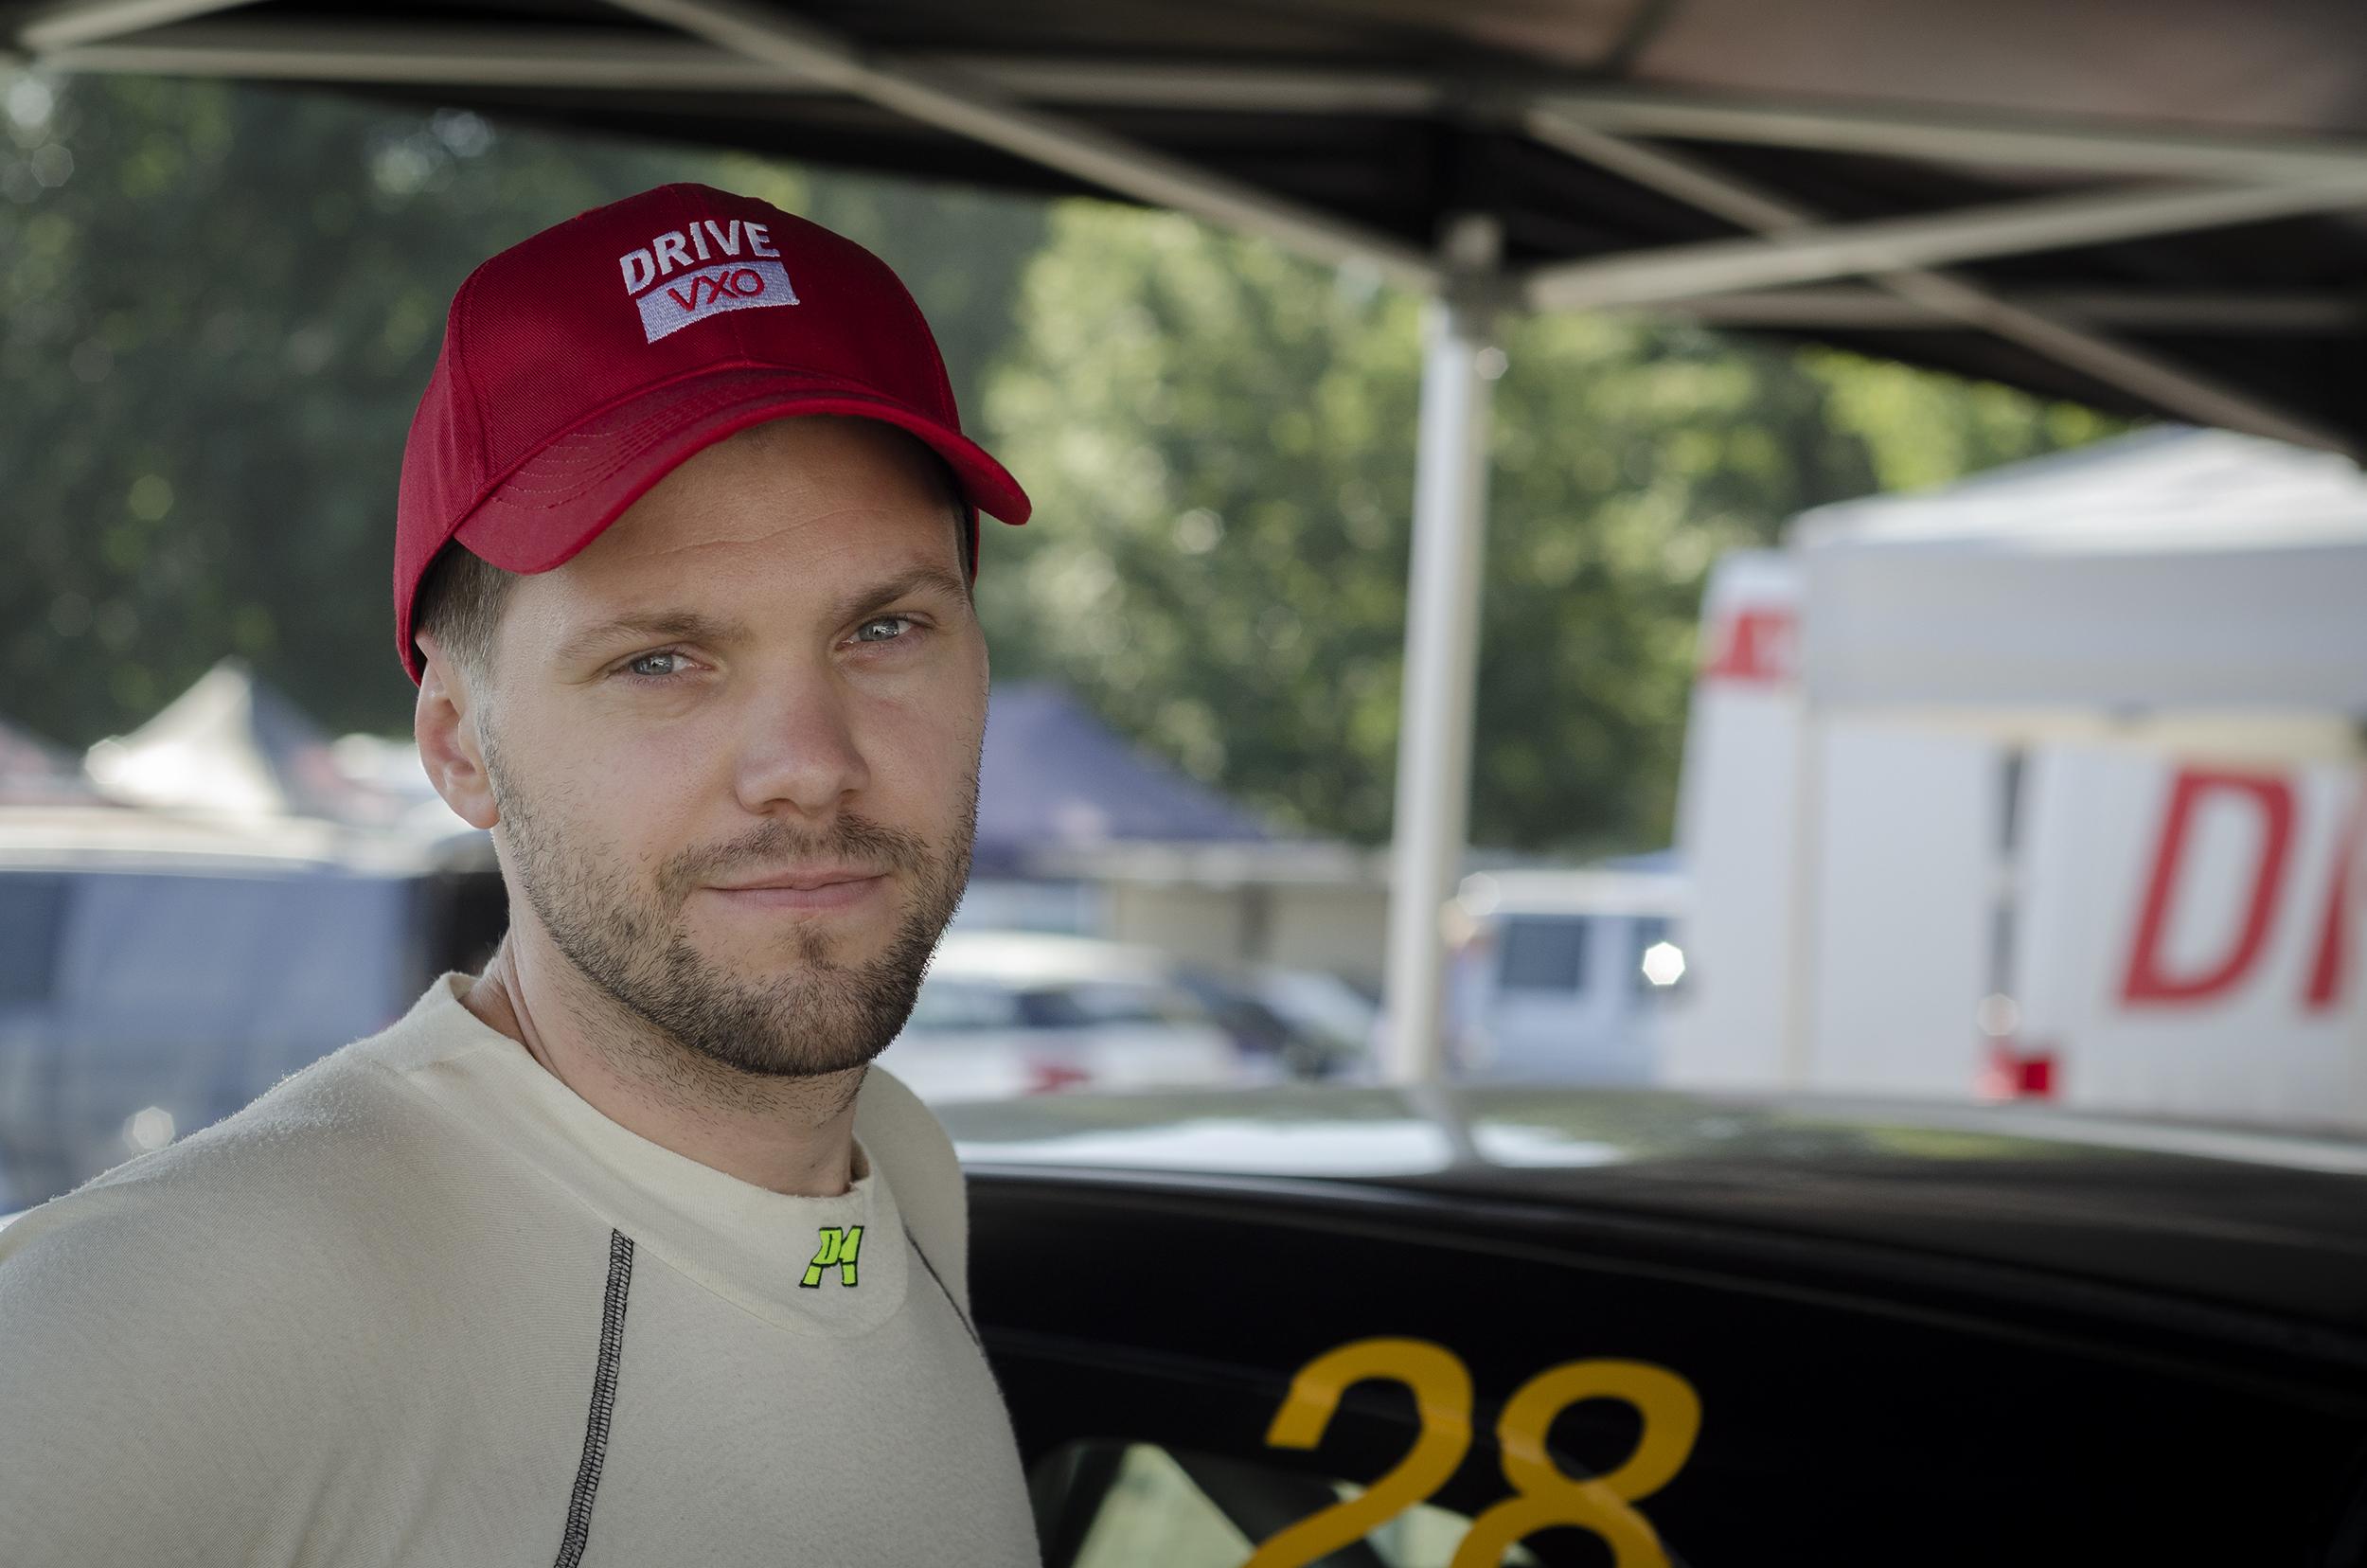 Emrik Smedberg profilbild